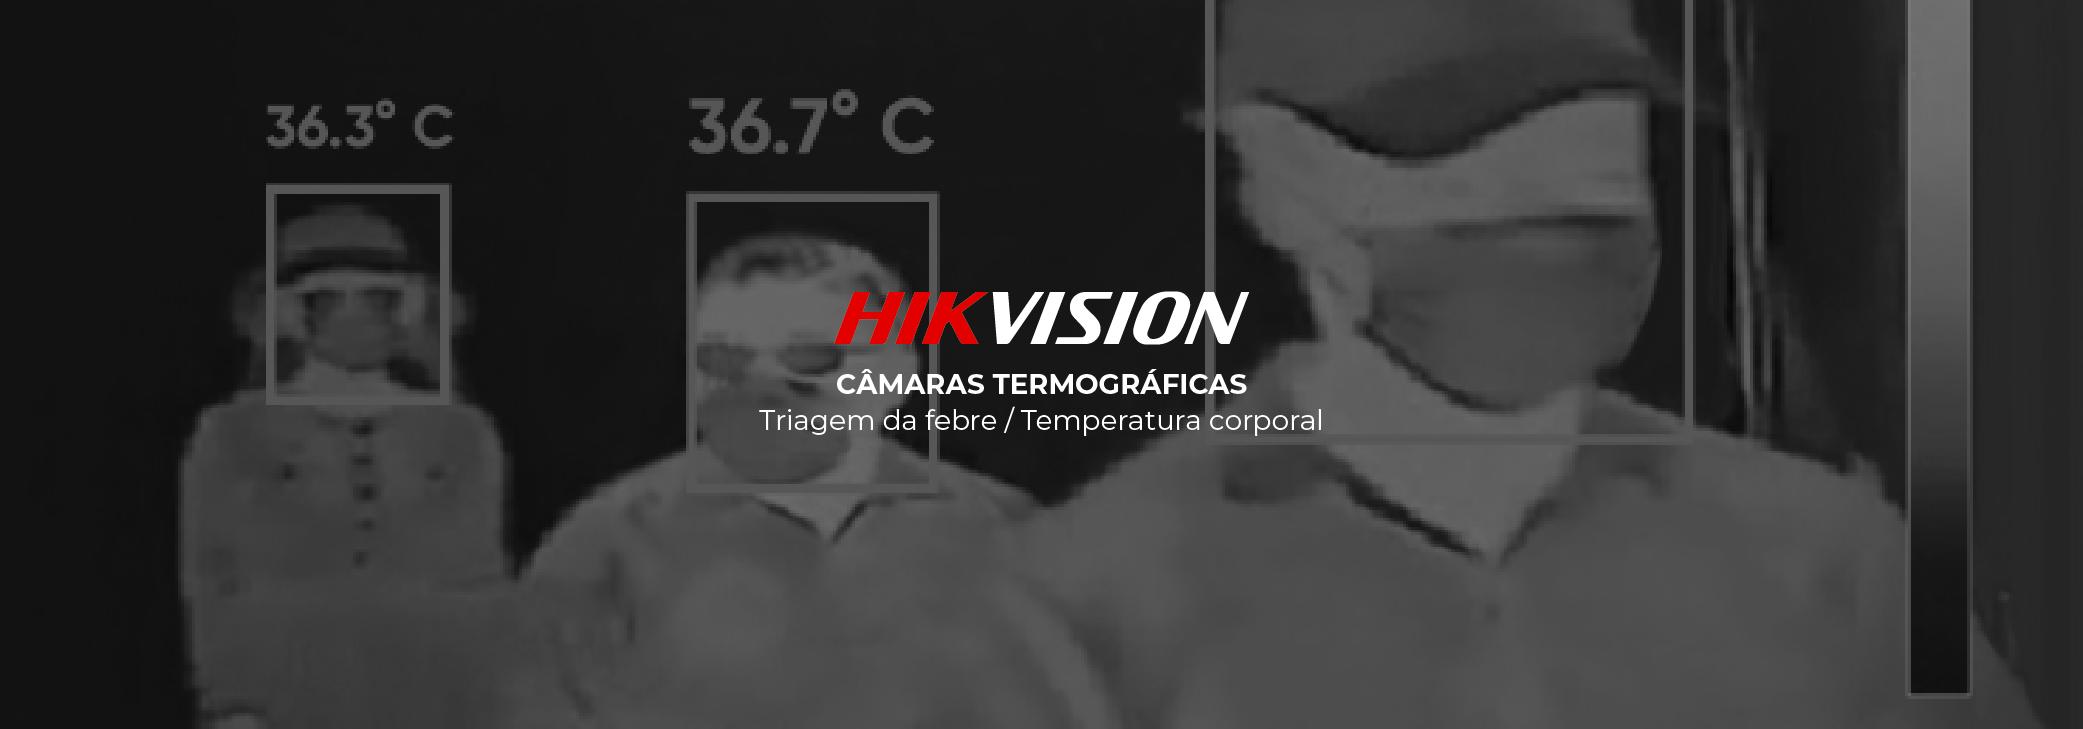 Câmaras termográficas Hikvision